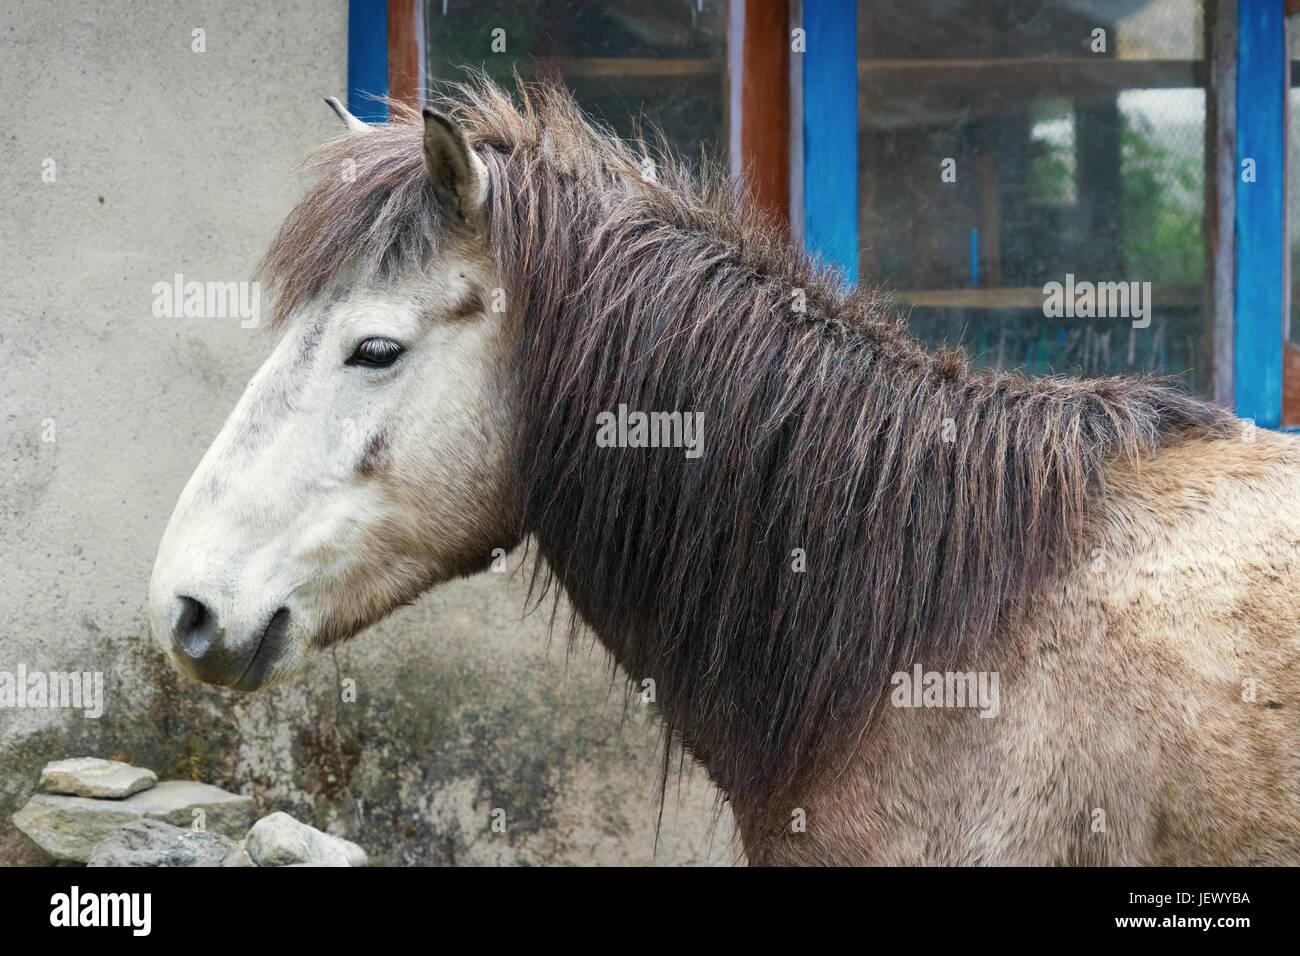 Closeup of a horse, Annapurna region, Nepal. - Stock Image